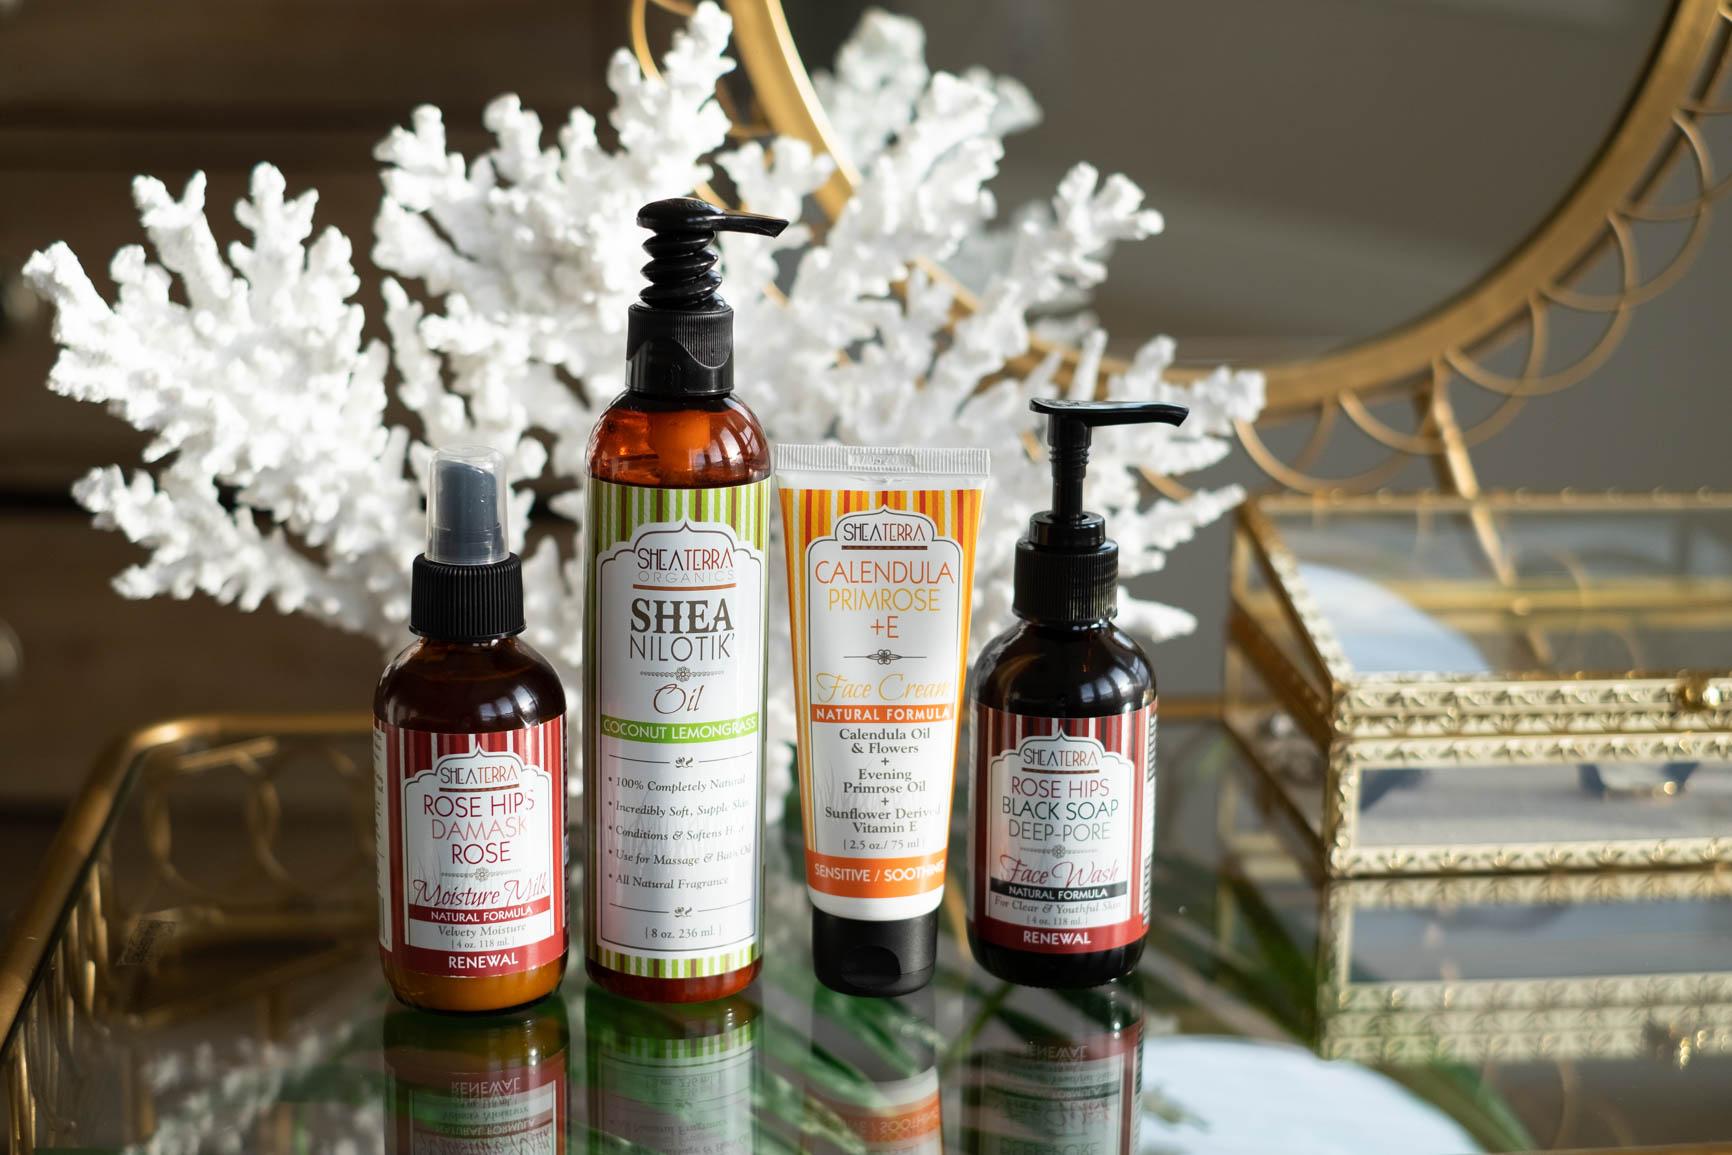 Shea Terra Organics Products